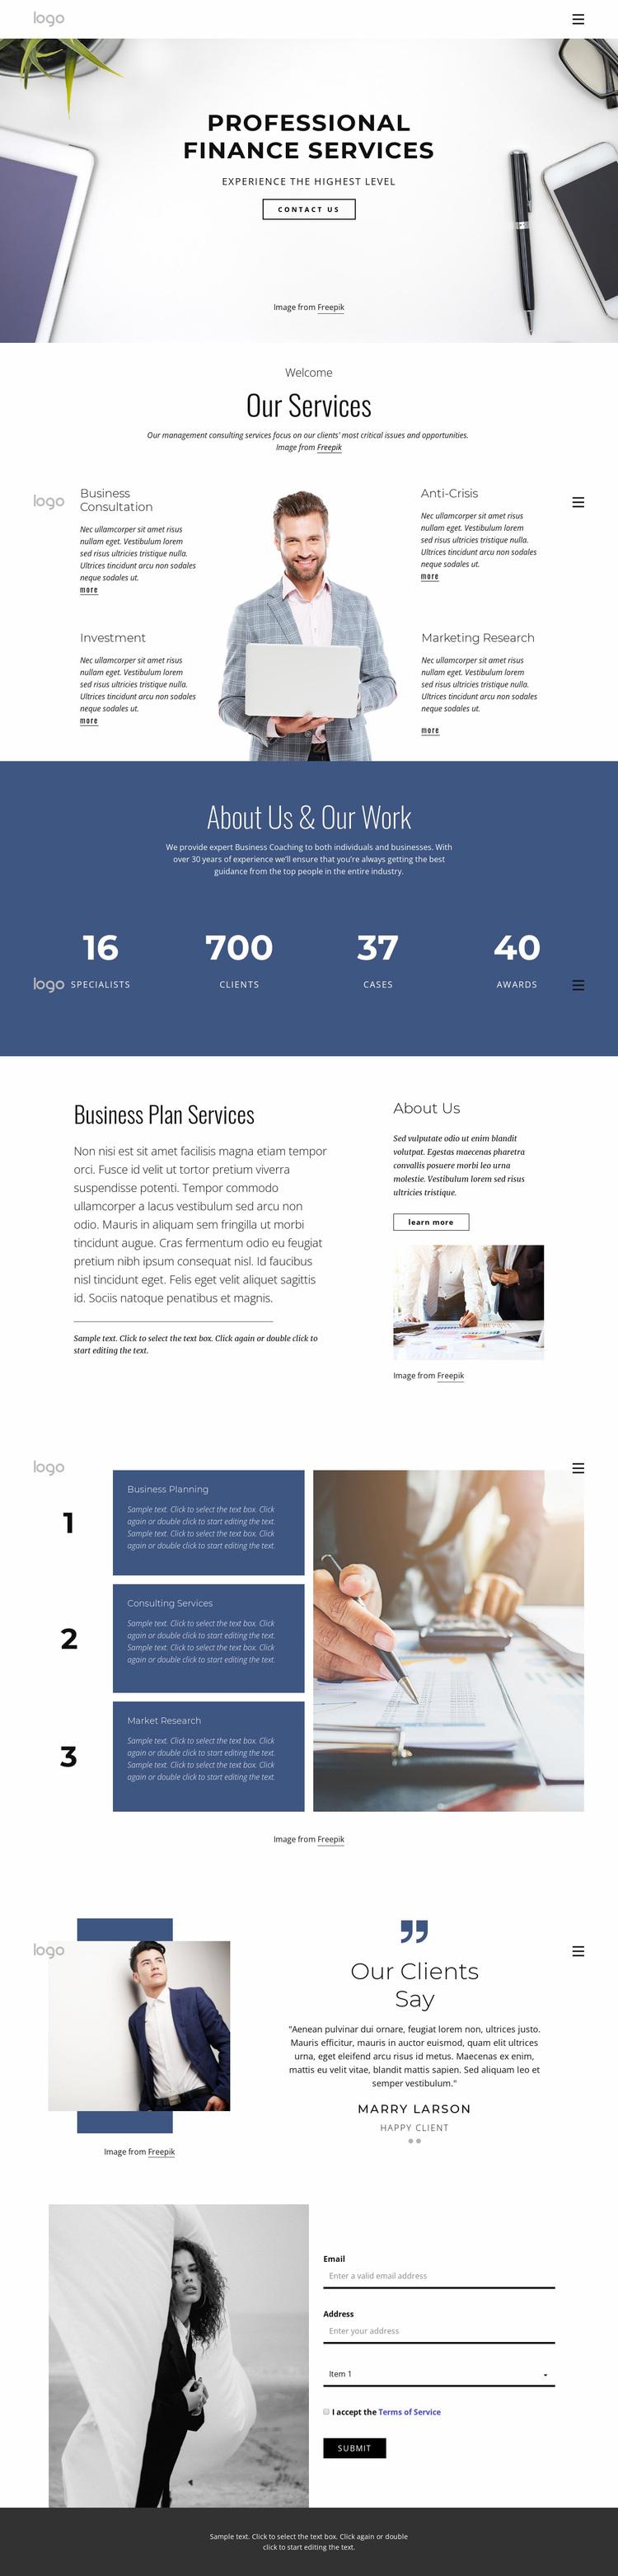 Professional finance services Website Design